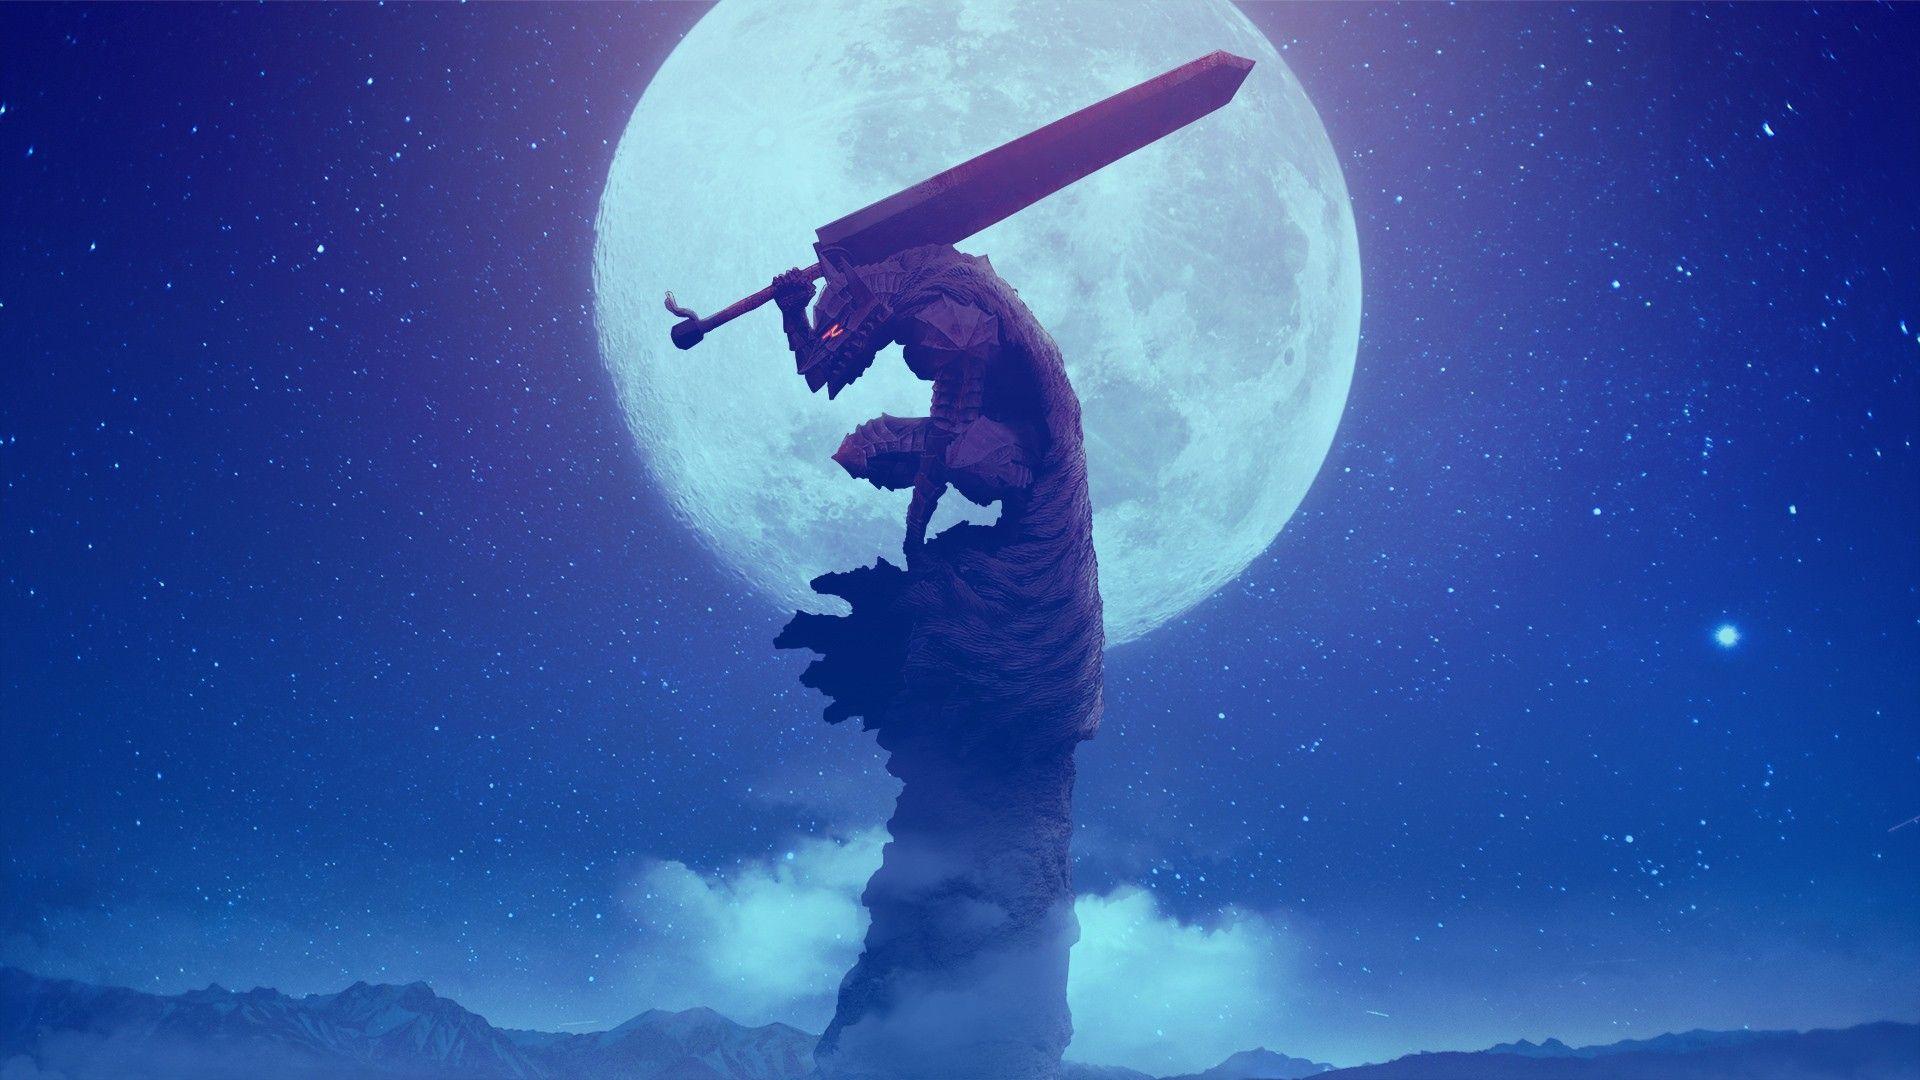 Anime 1920x1080 Berserk Black Swordsman Guts Berserk